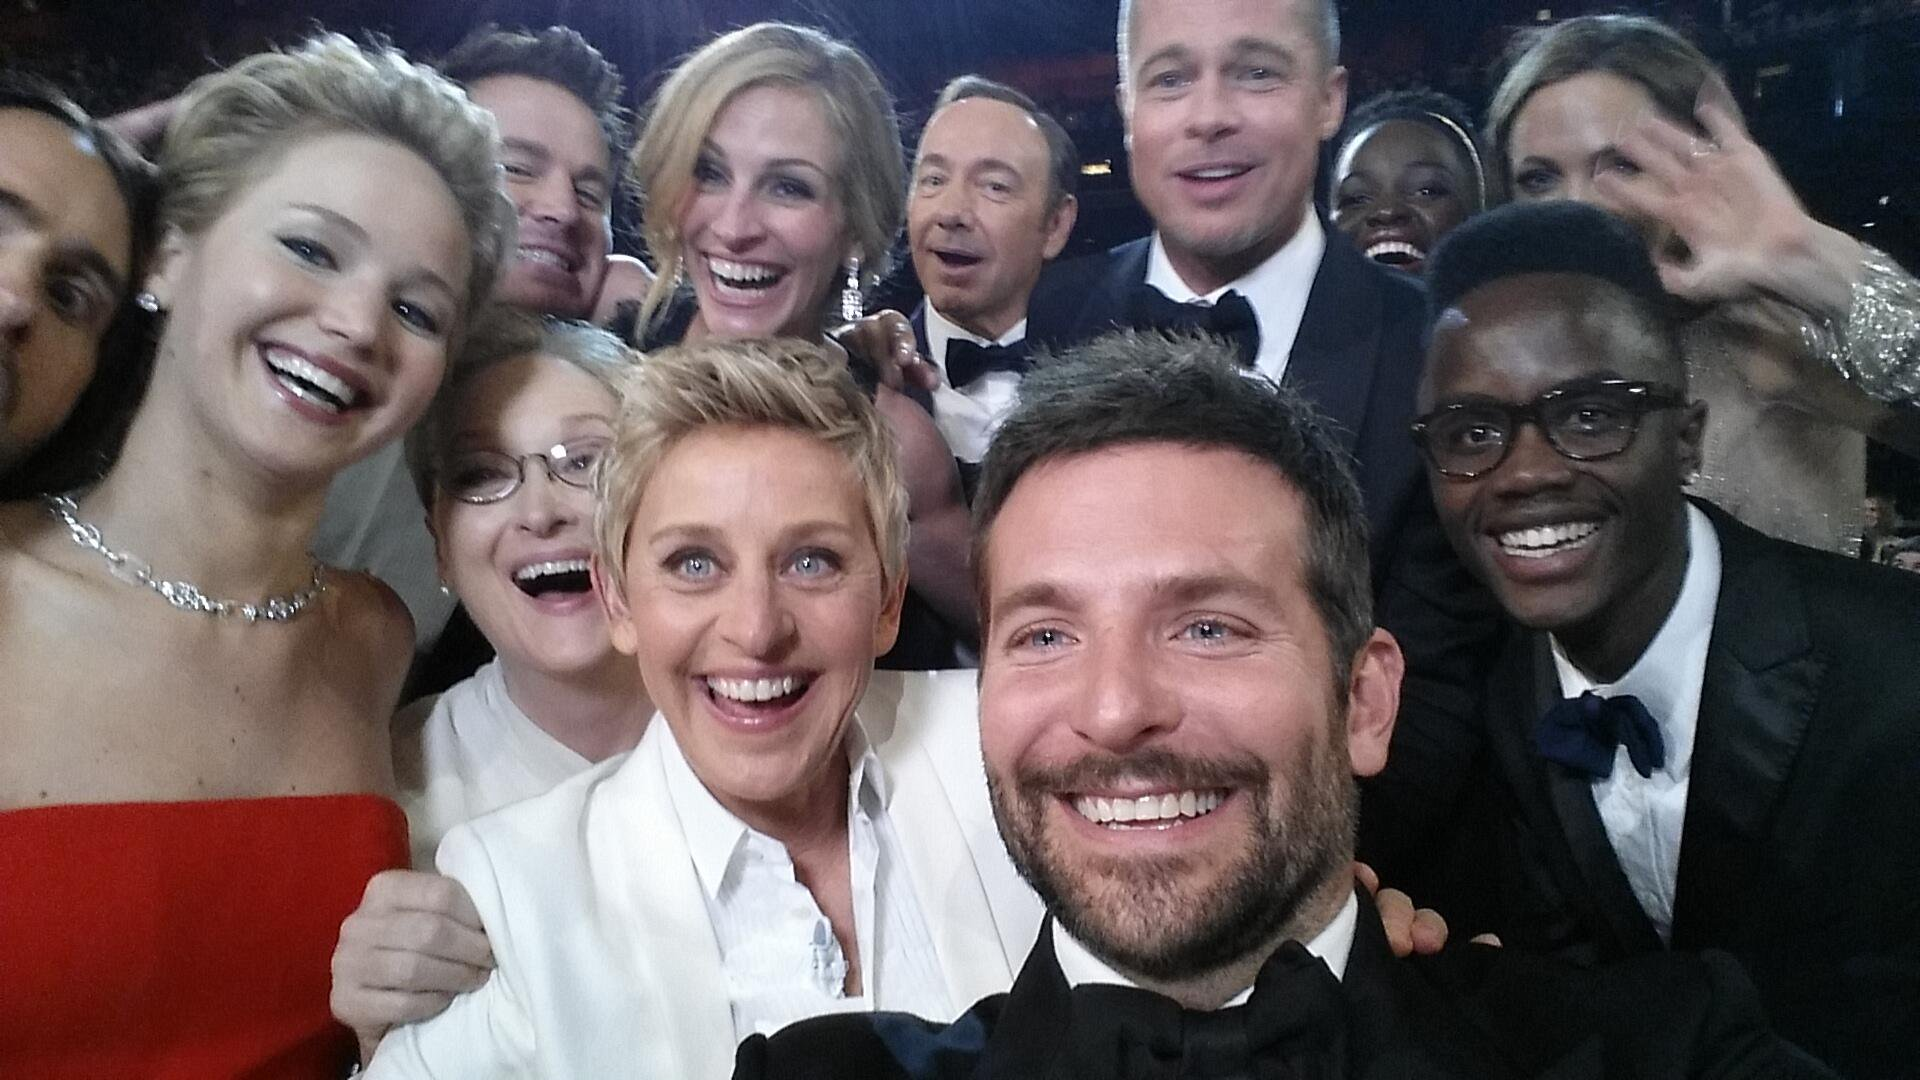 A famous group photo